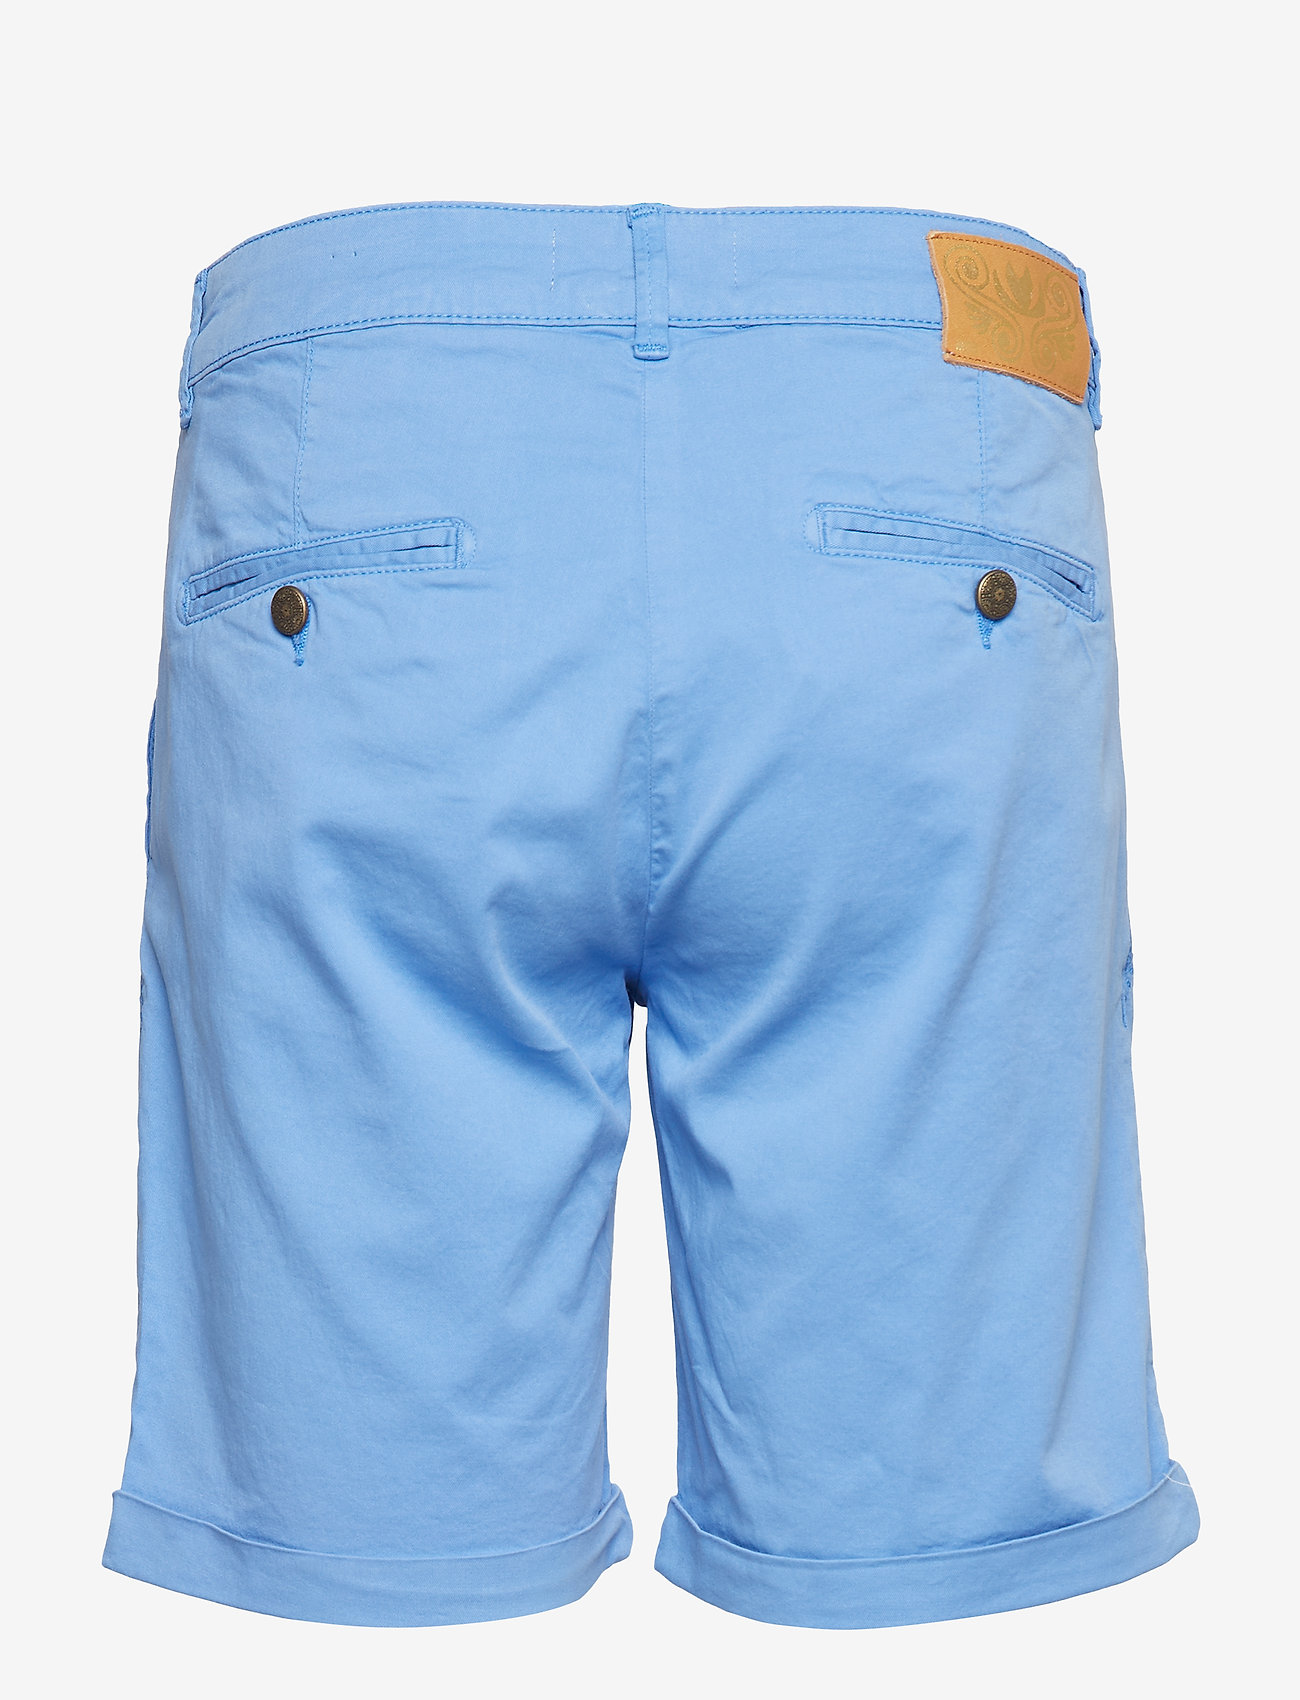 Perry Chino Shorts (Ultramarine) - MOS MOSH cyMVop